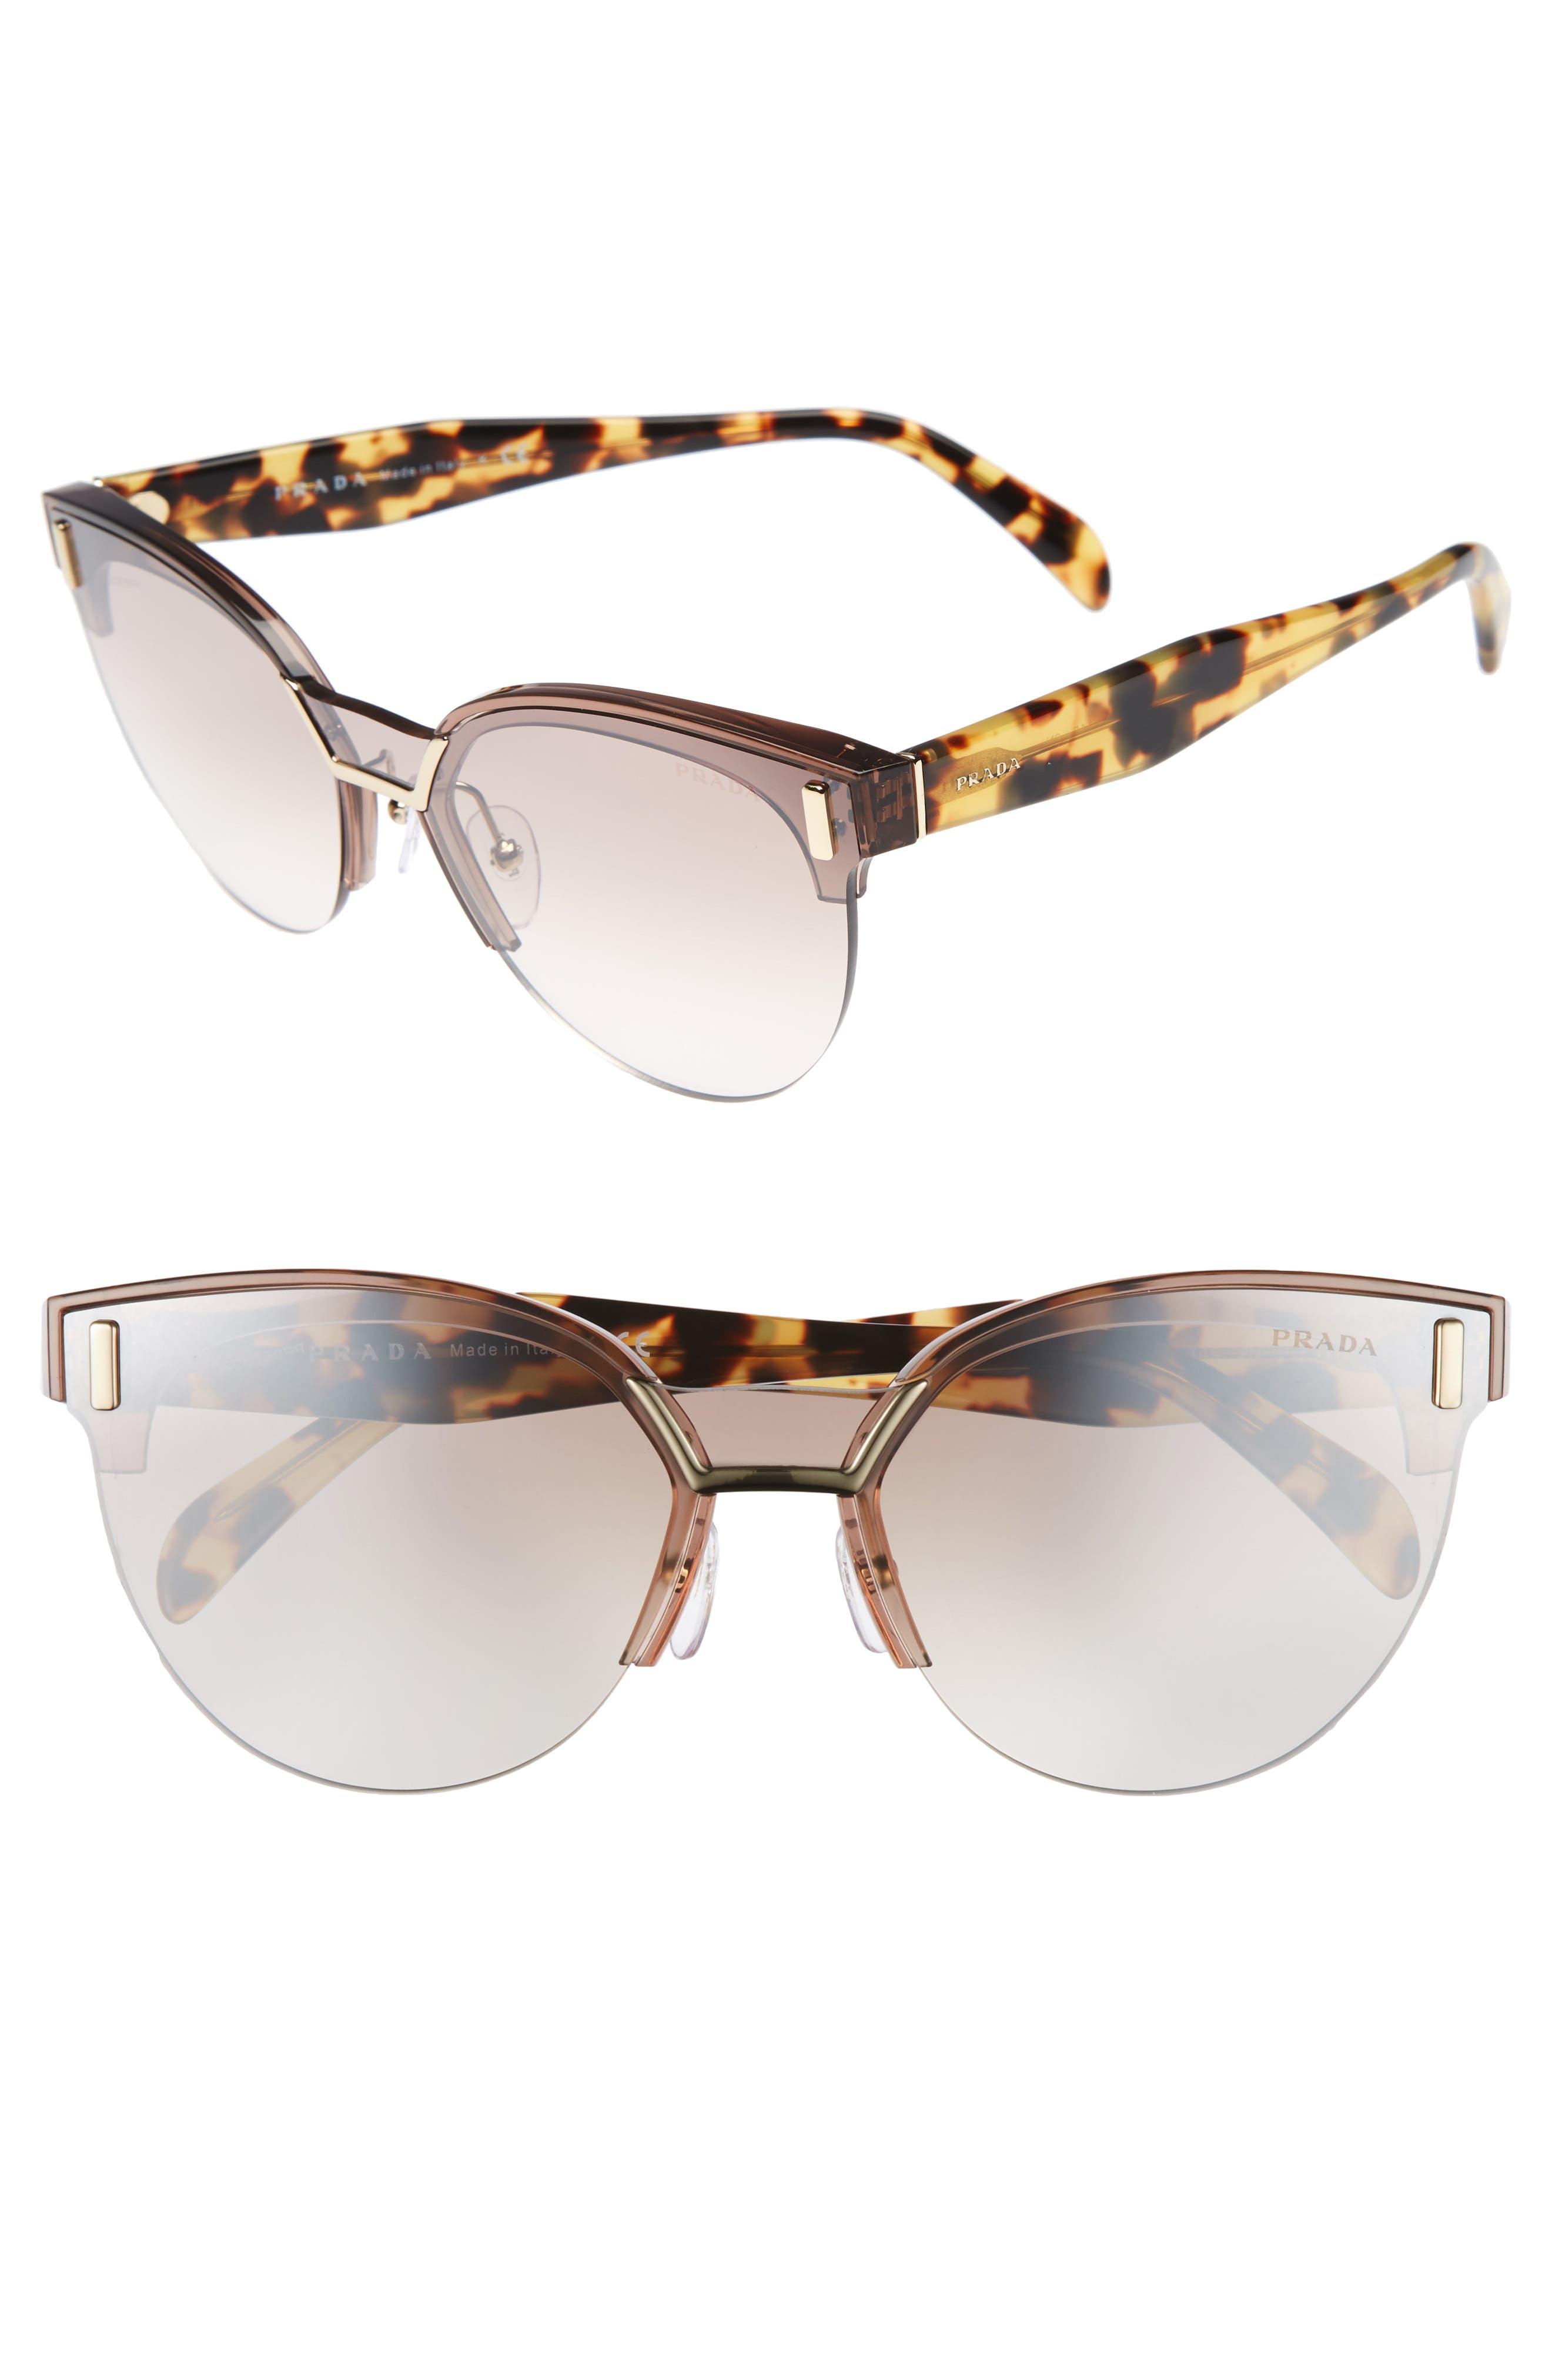 43mm Semi Rimless Sunglasses,                             Main thumbnail 1, color,                             TRANSPARENT BROWN